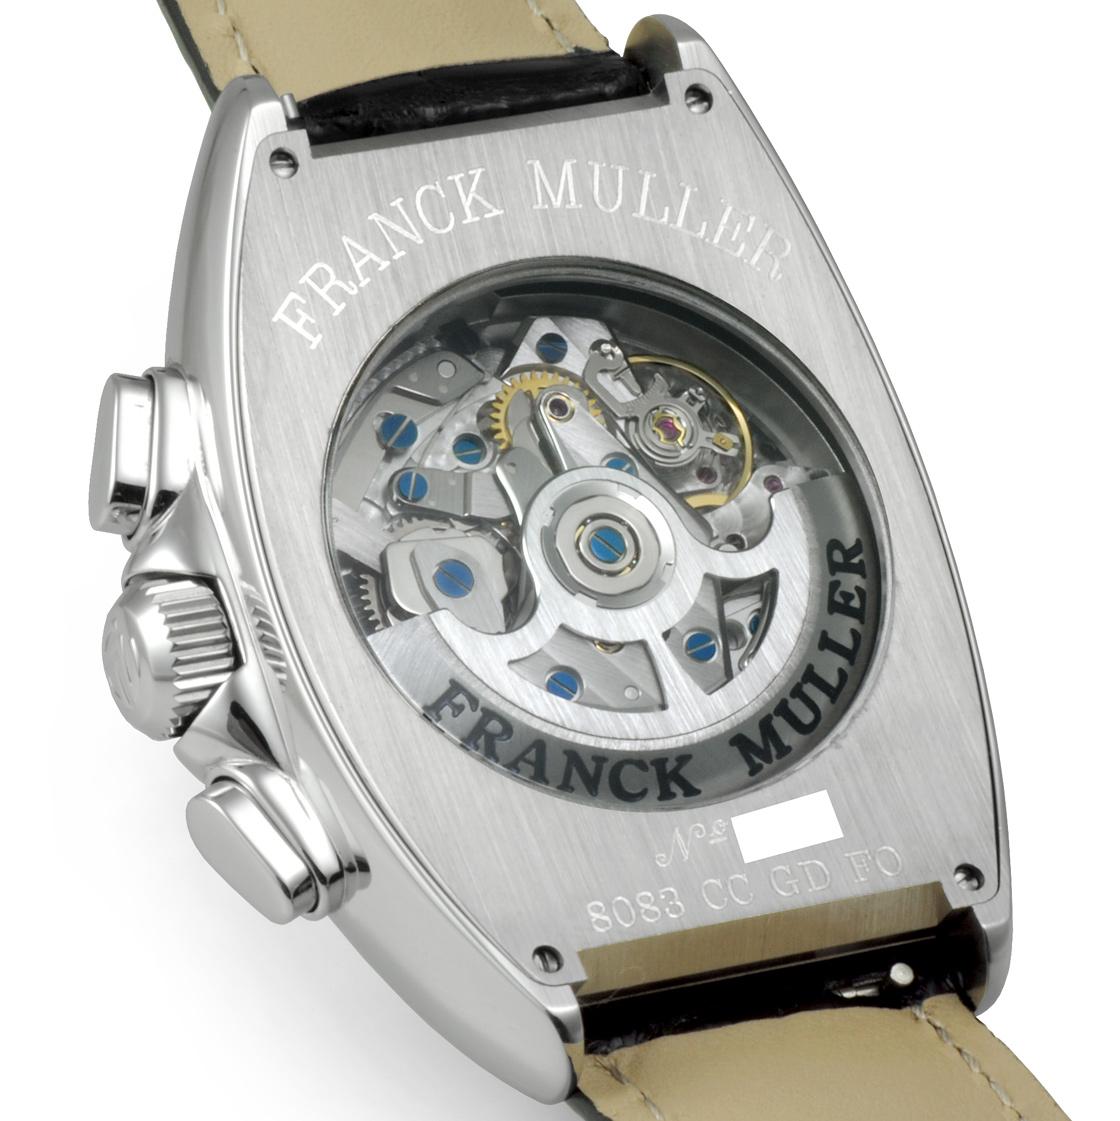 Franck Muller 8083 CCGDFO 男高音 curvex 計時格蘭德日期 SS / 皮革自動纏繞骨架的黑色錶盤